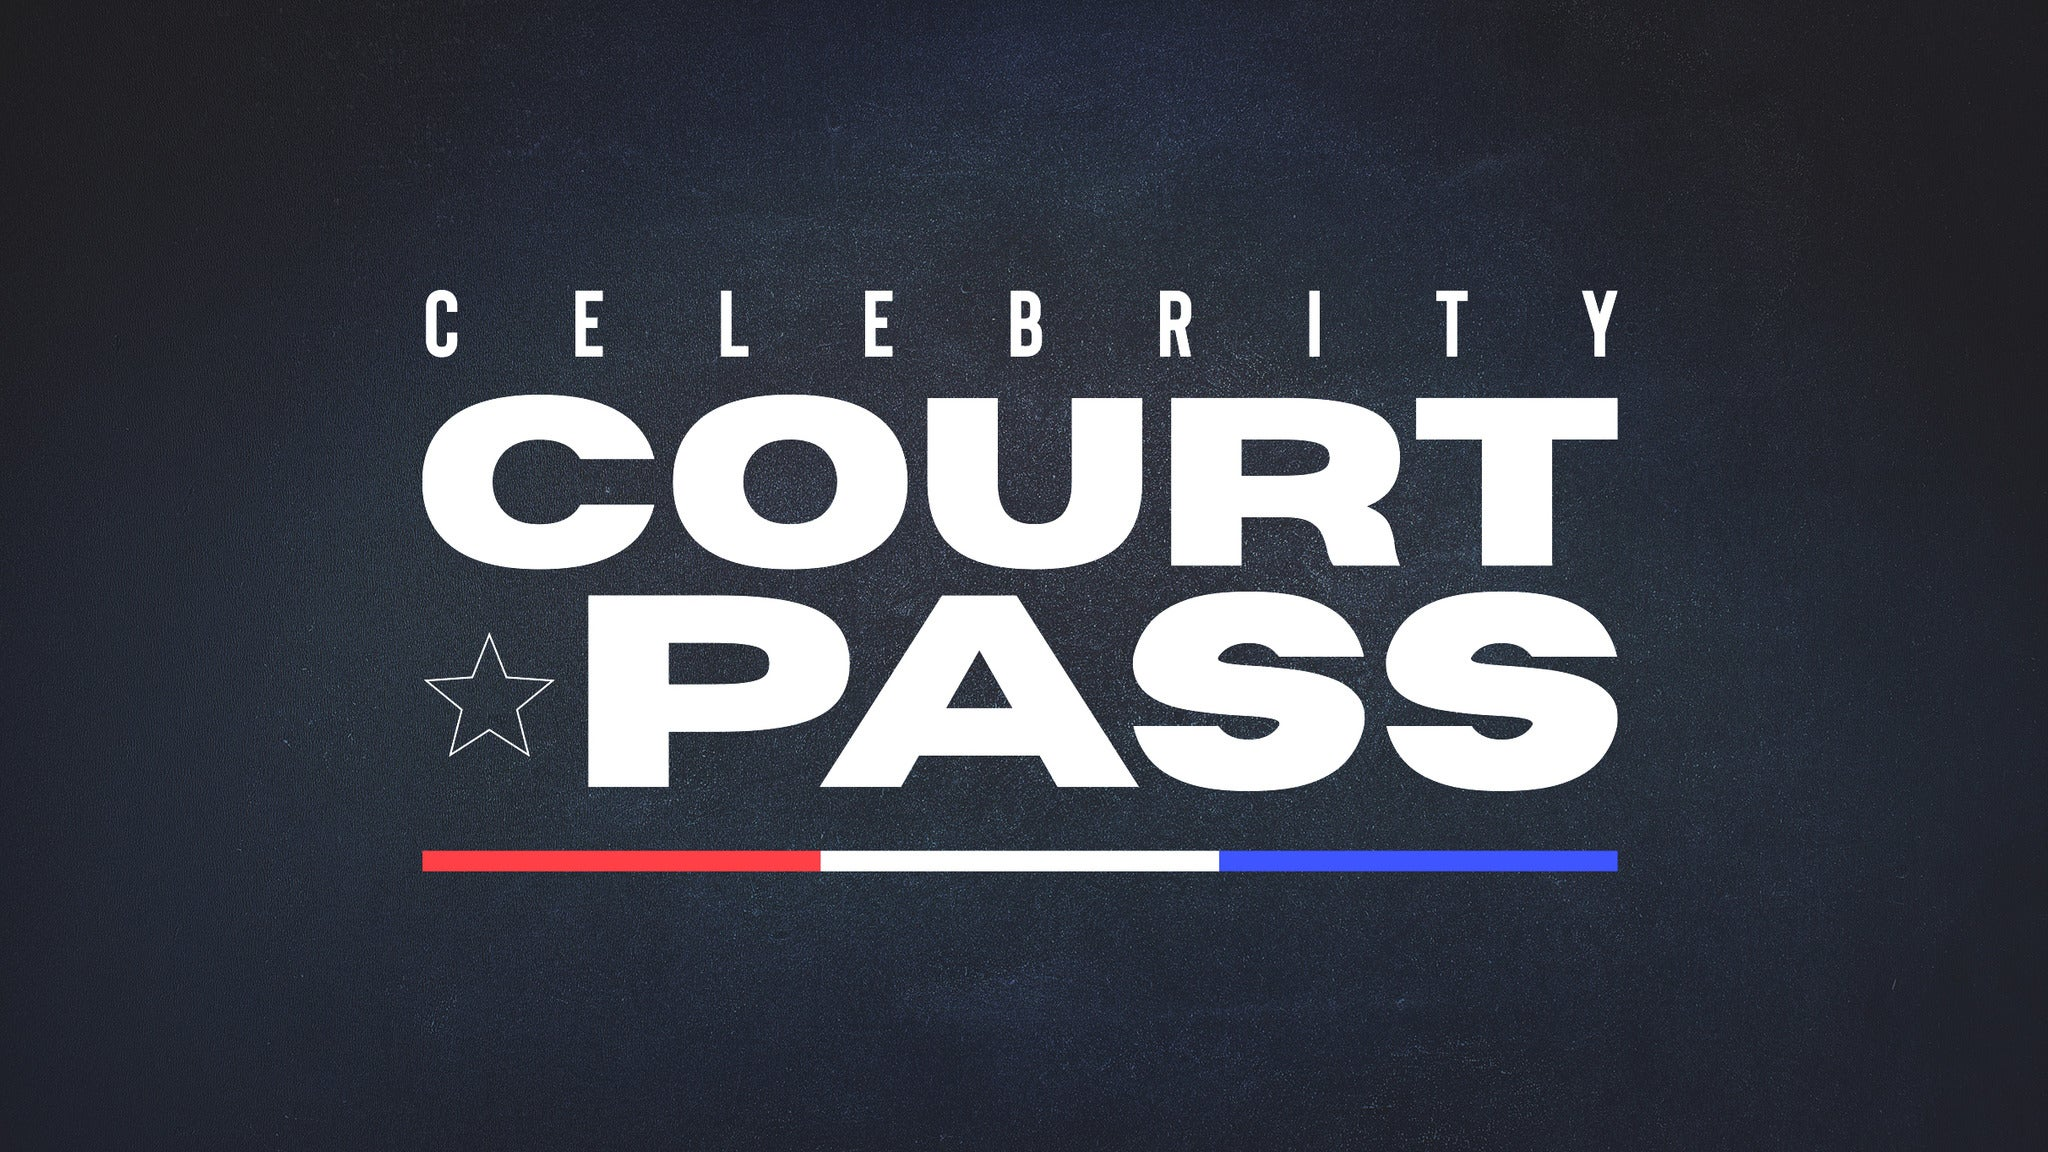 Harlem Globetrotters Celebrity Court Pass